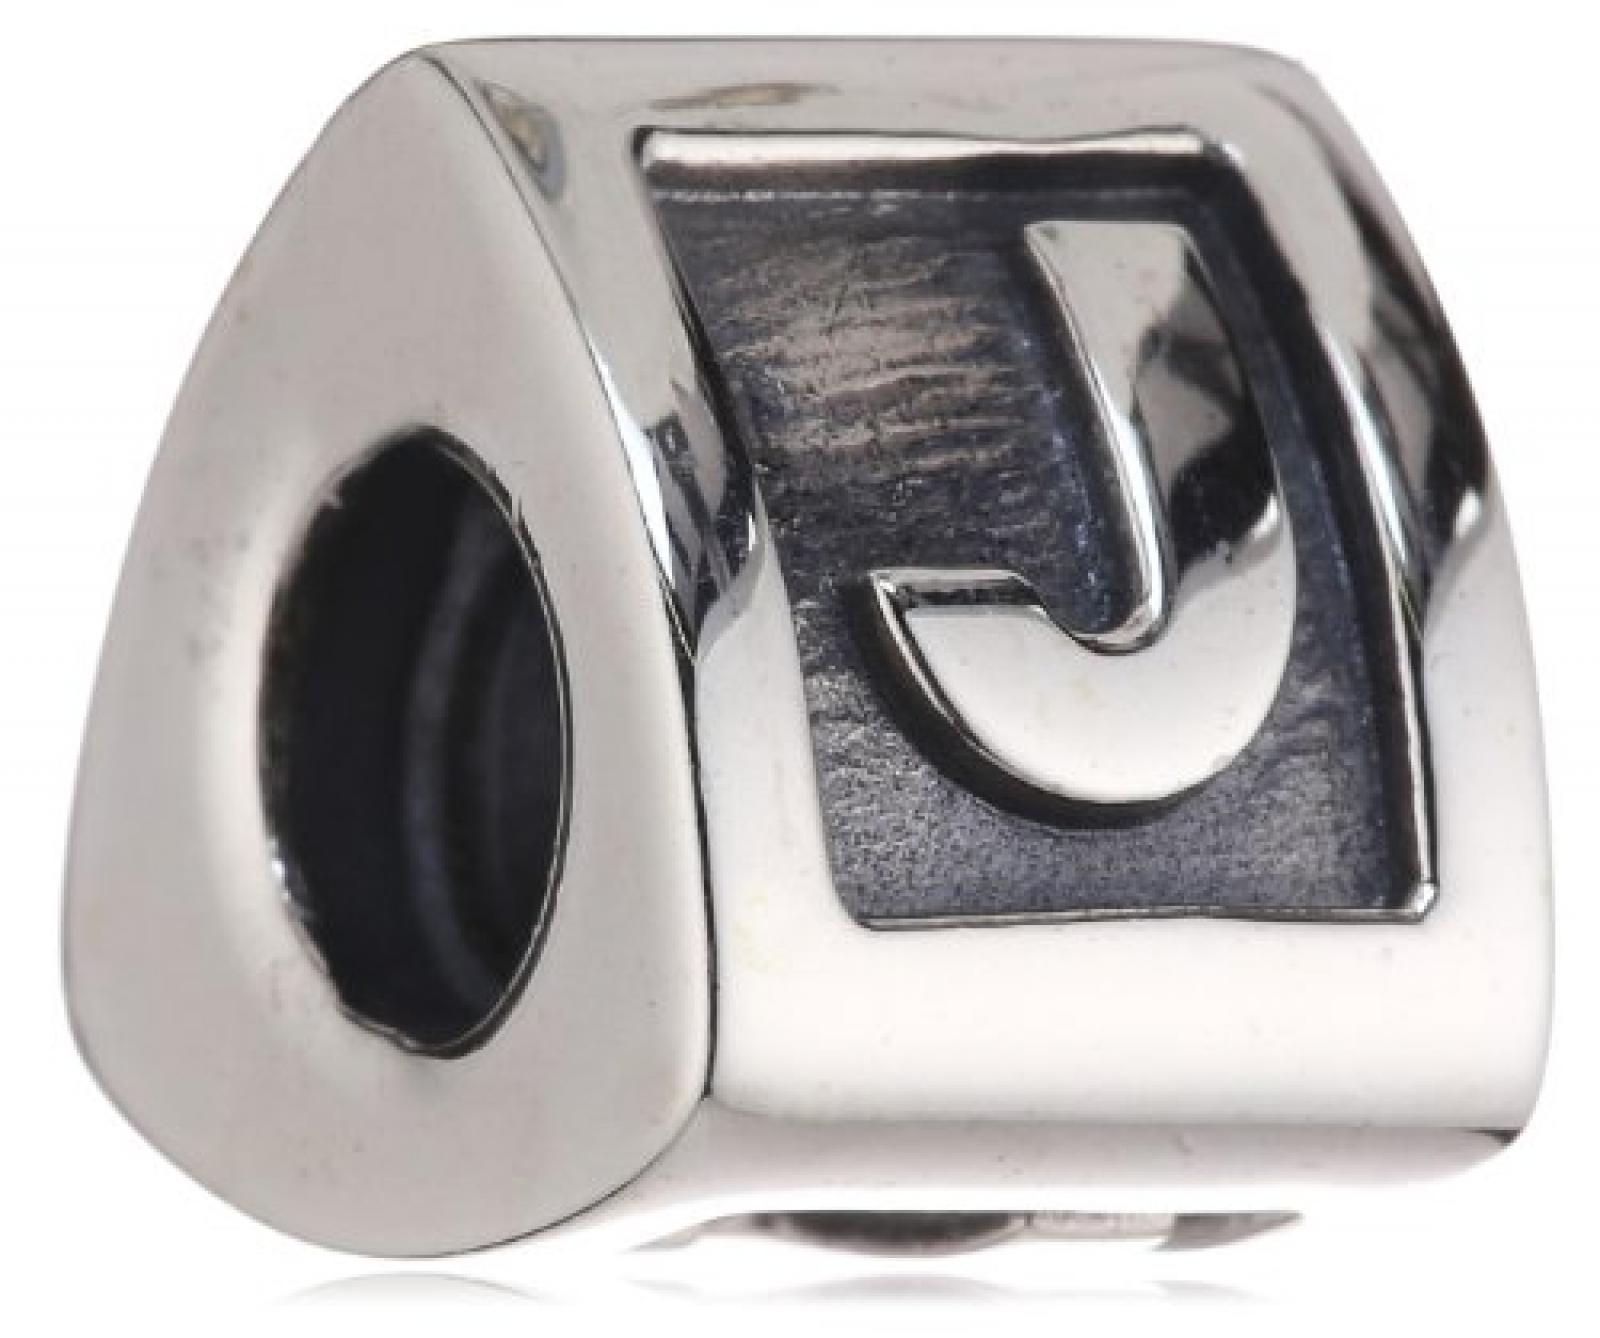 "Pandora Damen-Bead  Sterling-Silber 925 Buchstabenelement ""J"" KASI 79323-J"